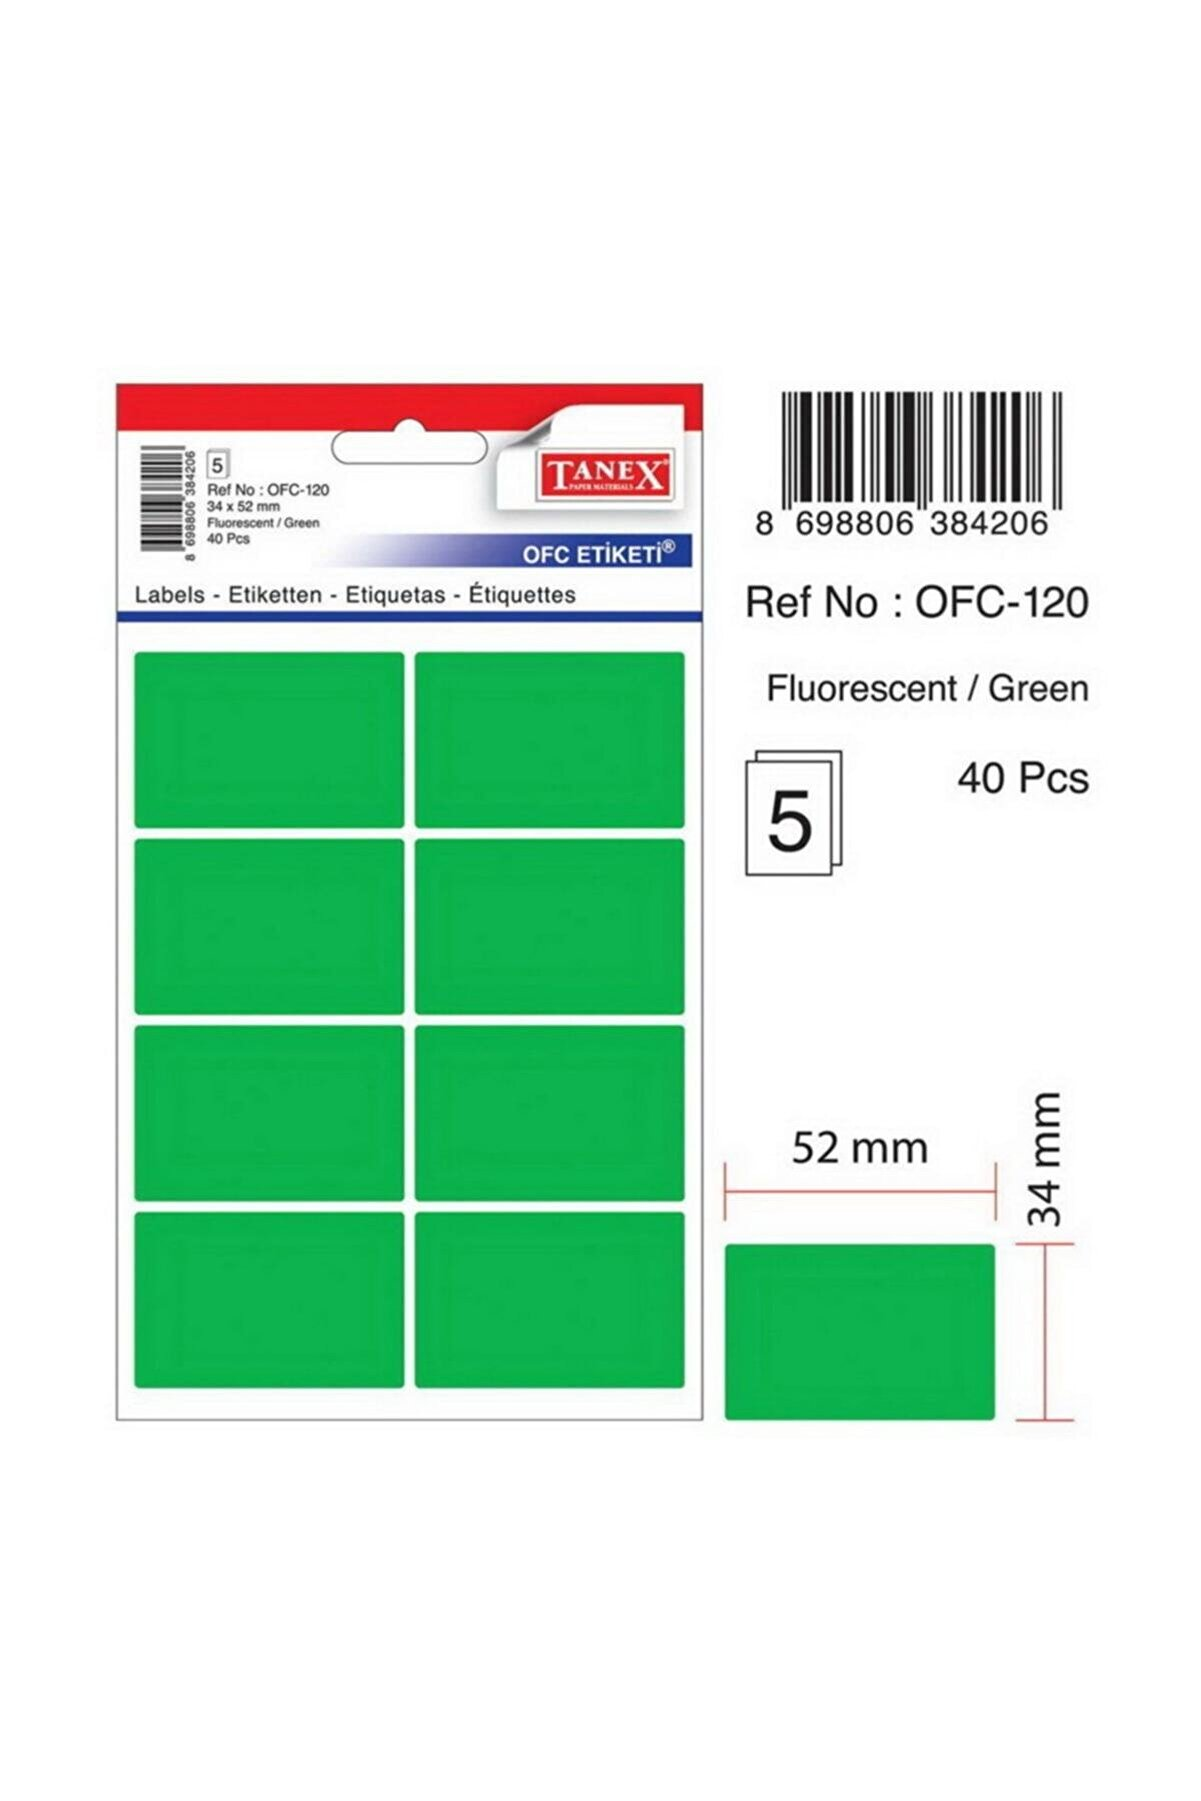 Tanex Ofc-120 Çıkartma Etiket 52x34 Mm (yeşil 80 Li - Renkliler 40 Lı Paket)